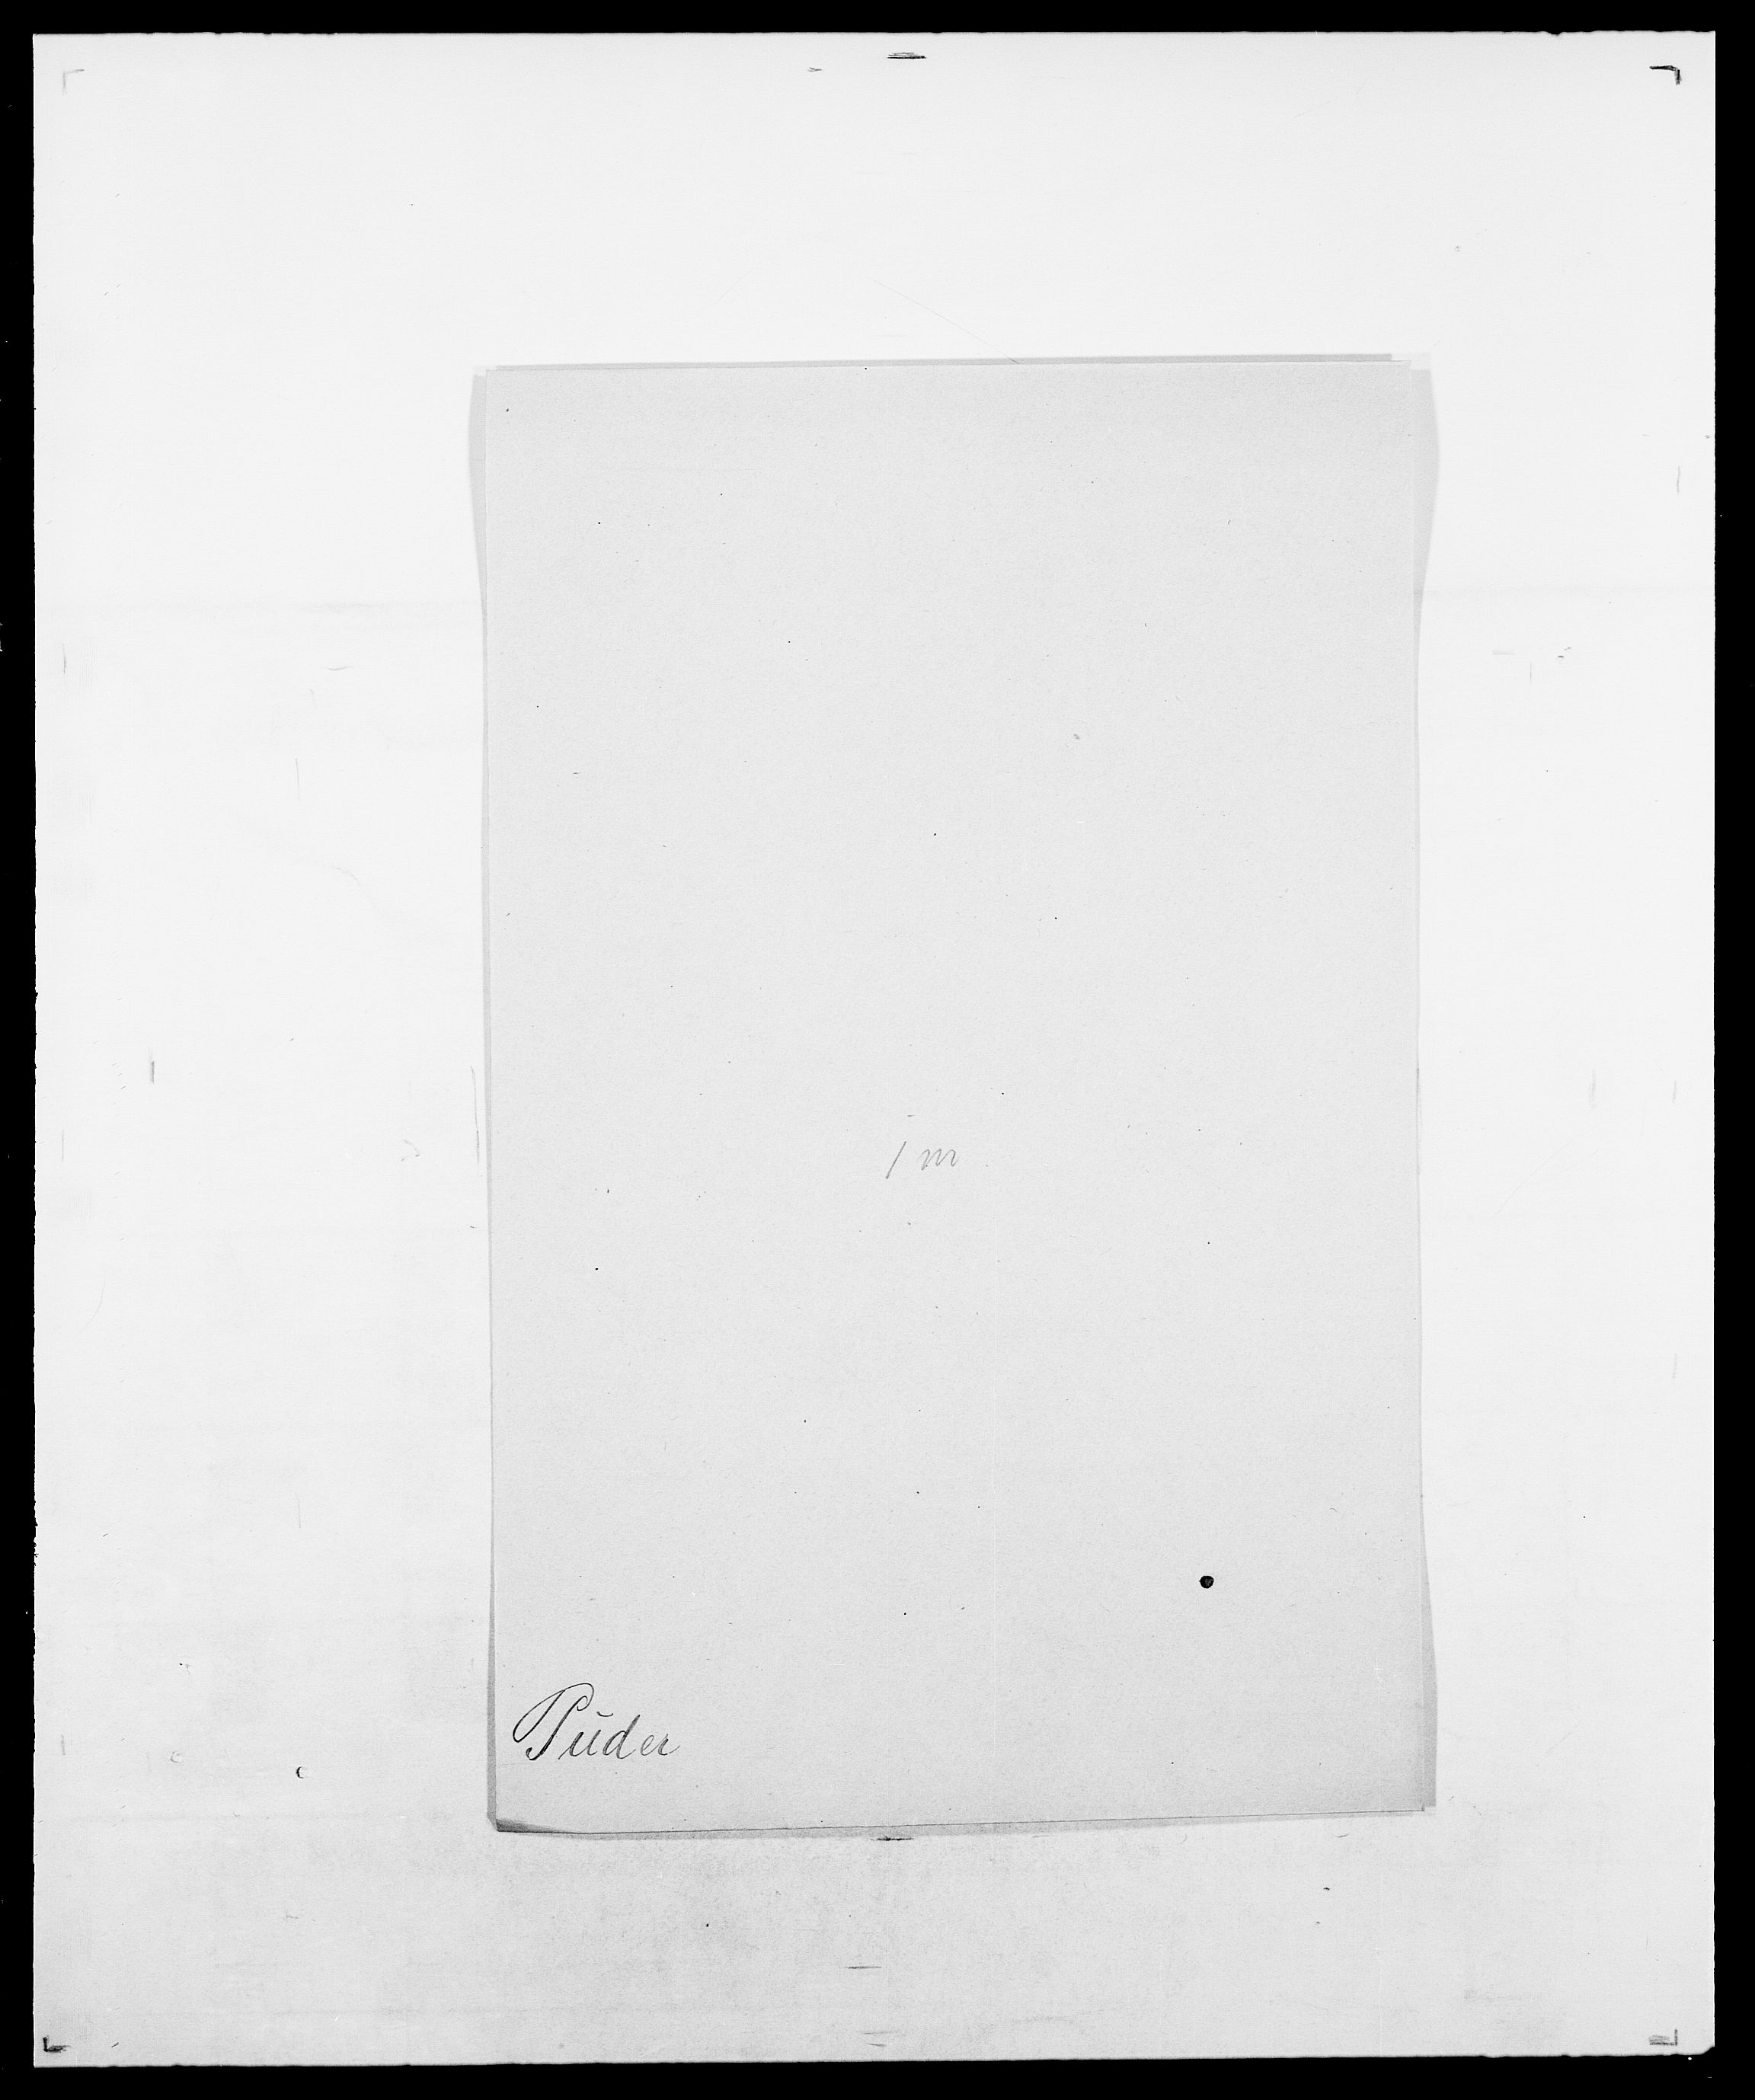 SAO, Delgobe, Charles Antoine - samling, D/Da/L0031: de Place - Raaum, s. 428